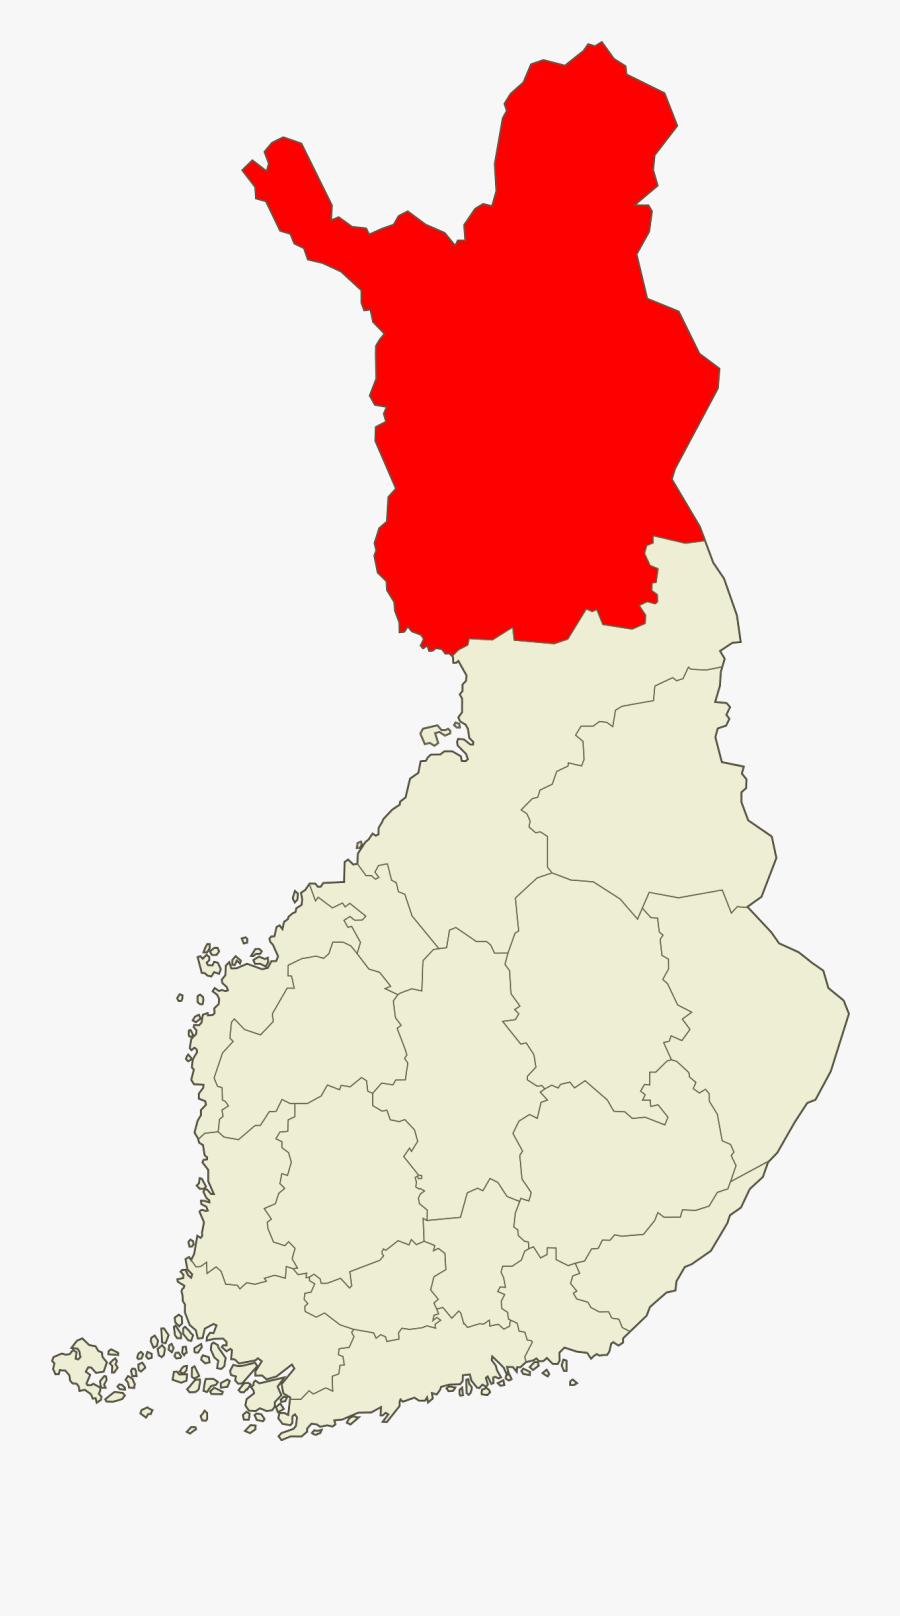 Clip Art Lapland Wikipedia - Finland Population Map, Transparent Clipart